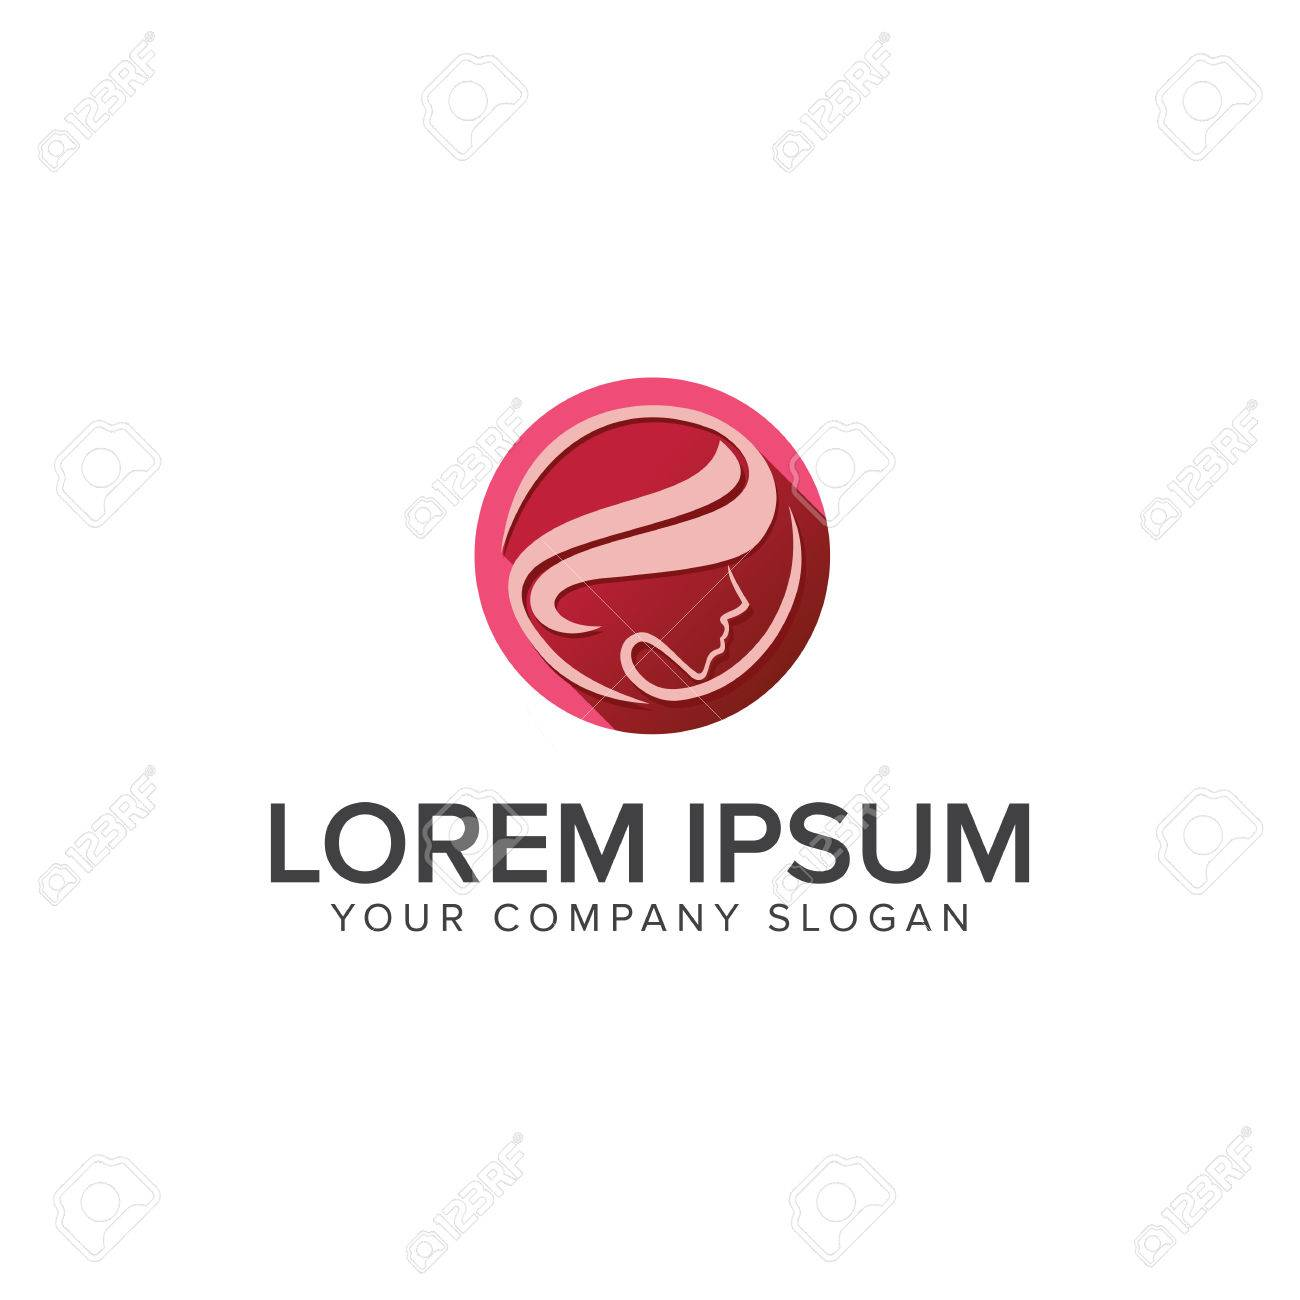 Beautiful Women Logos Spa Cosmetics And Beauty Logo Design